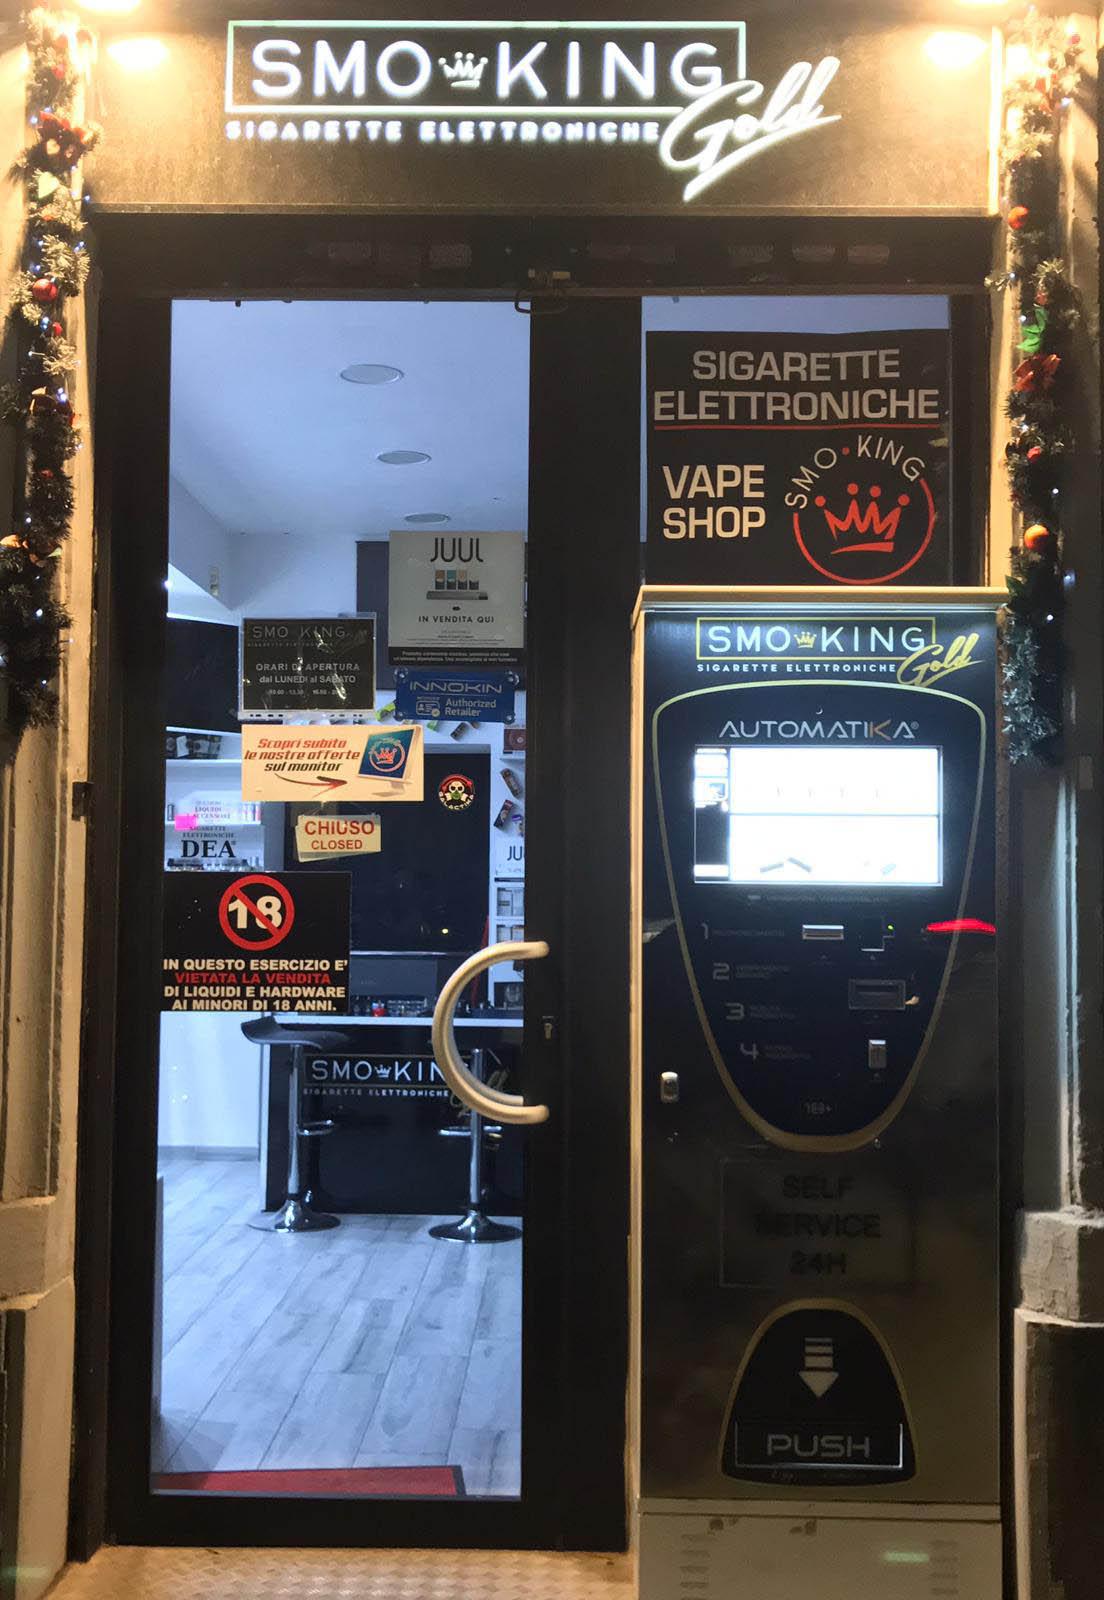 Distributore automatico Smo-King Aosta